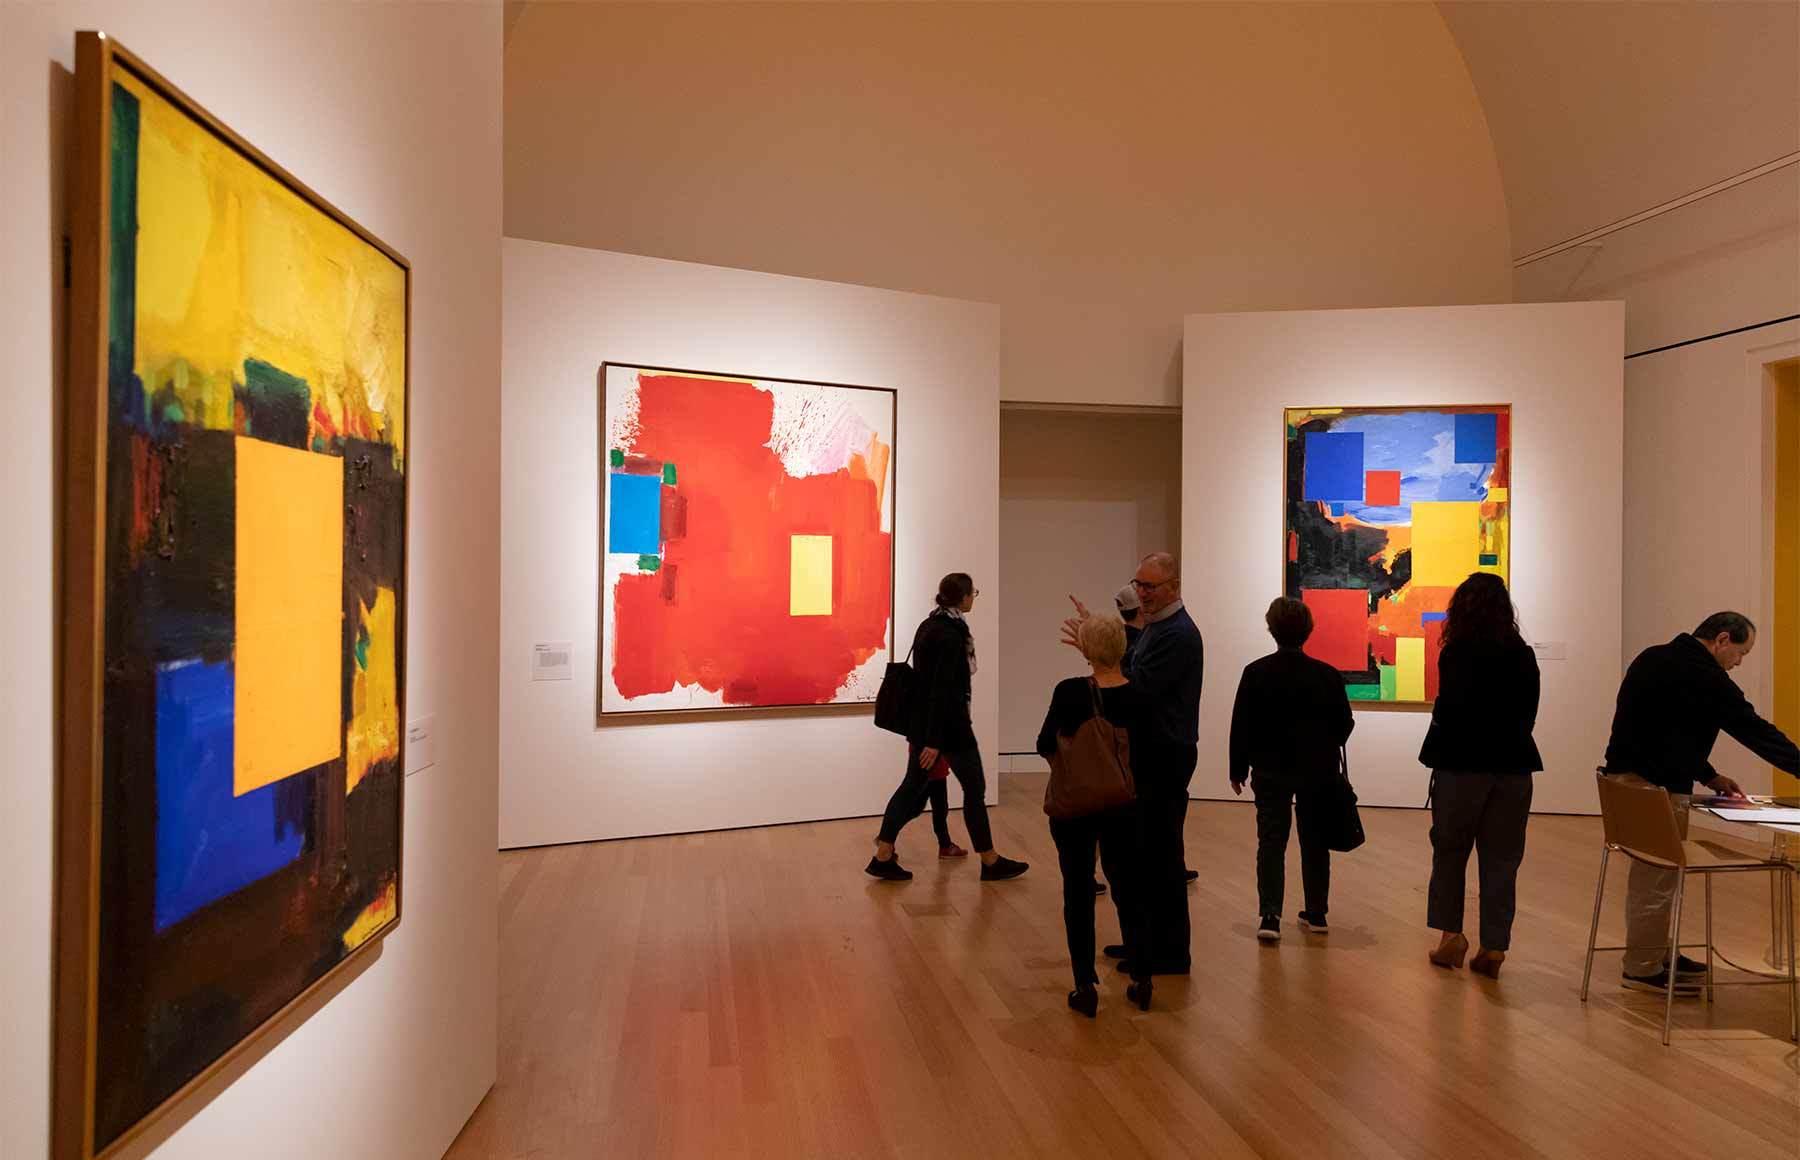 Visitors to the gallery, take in Hofmann paintings